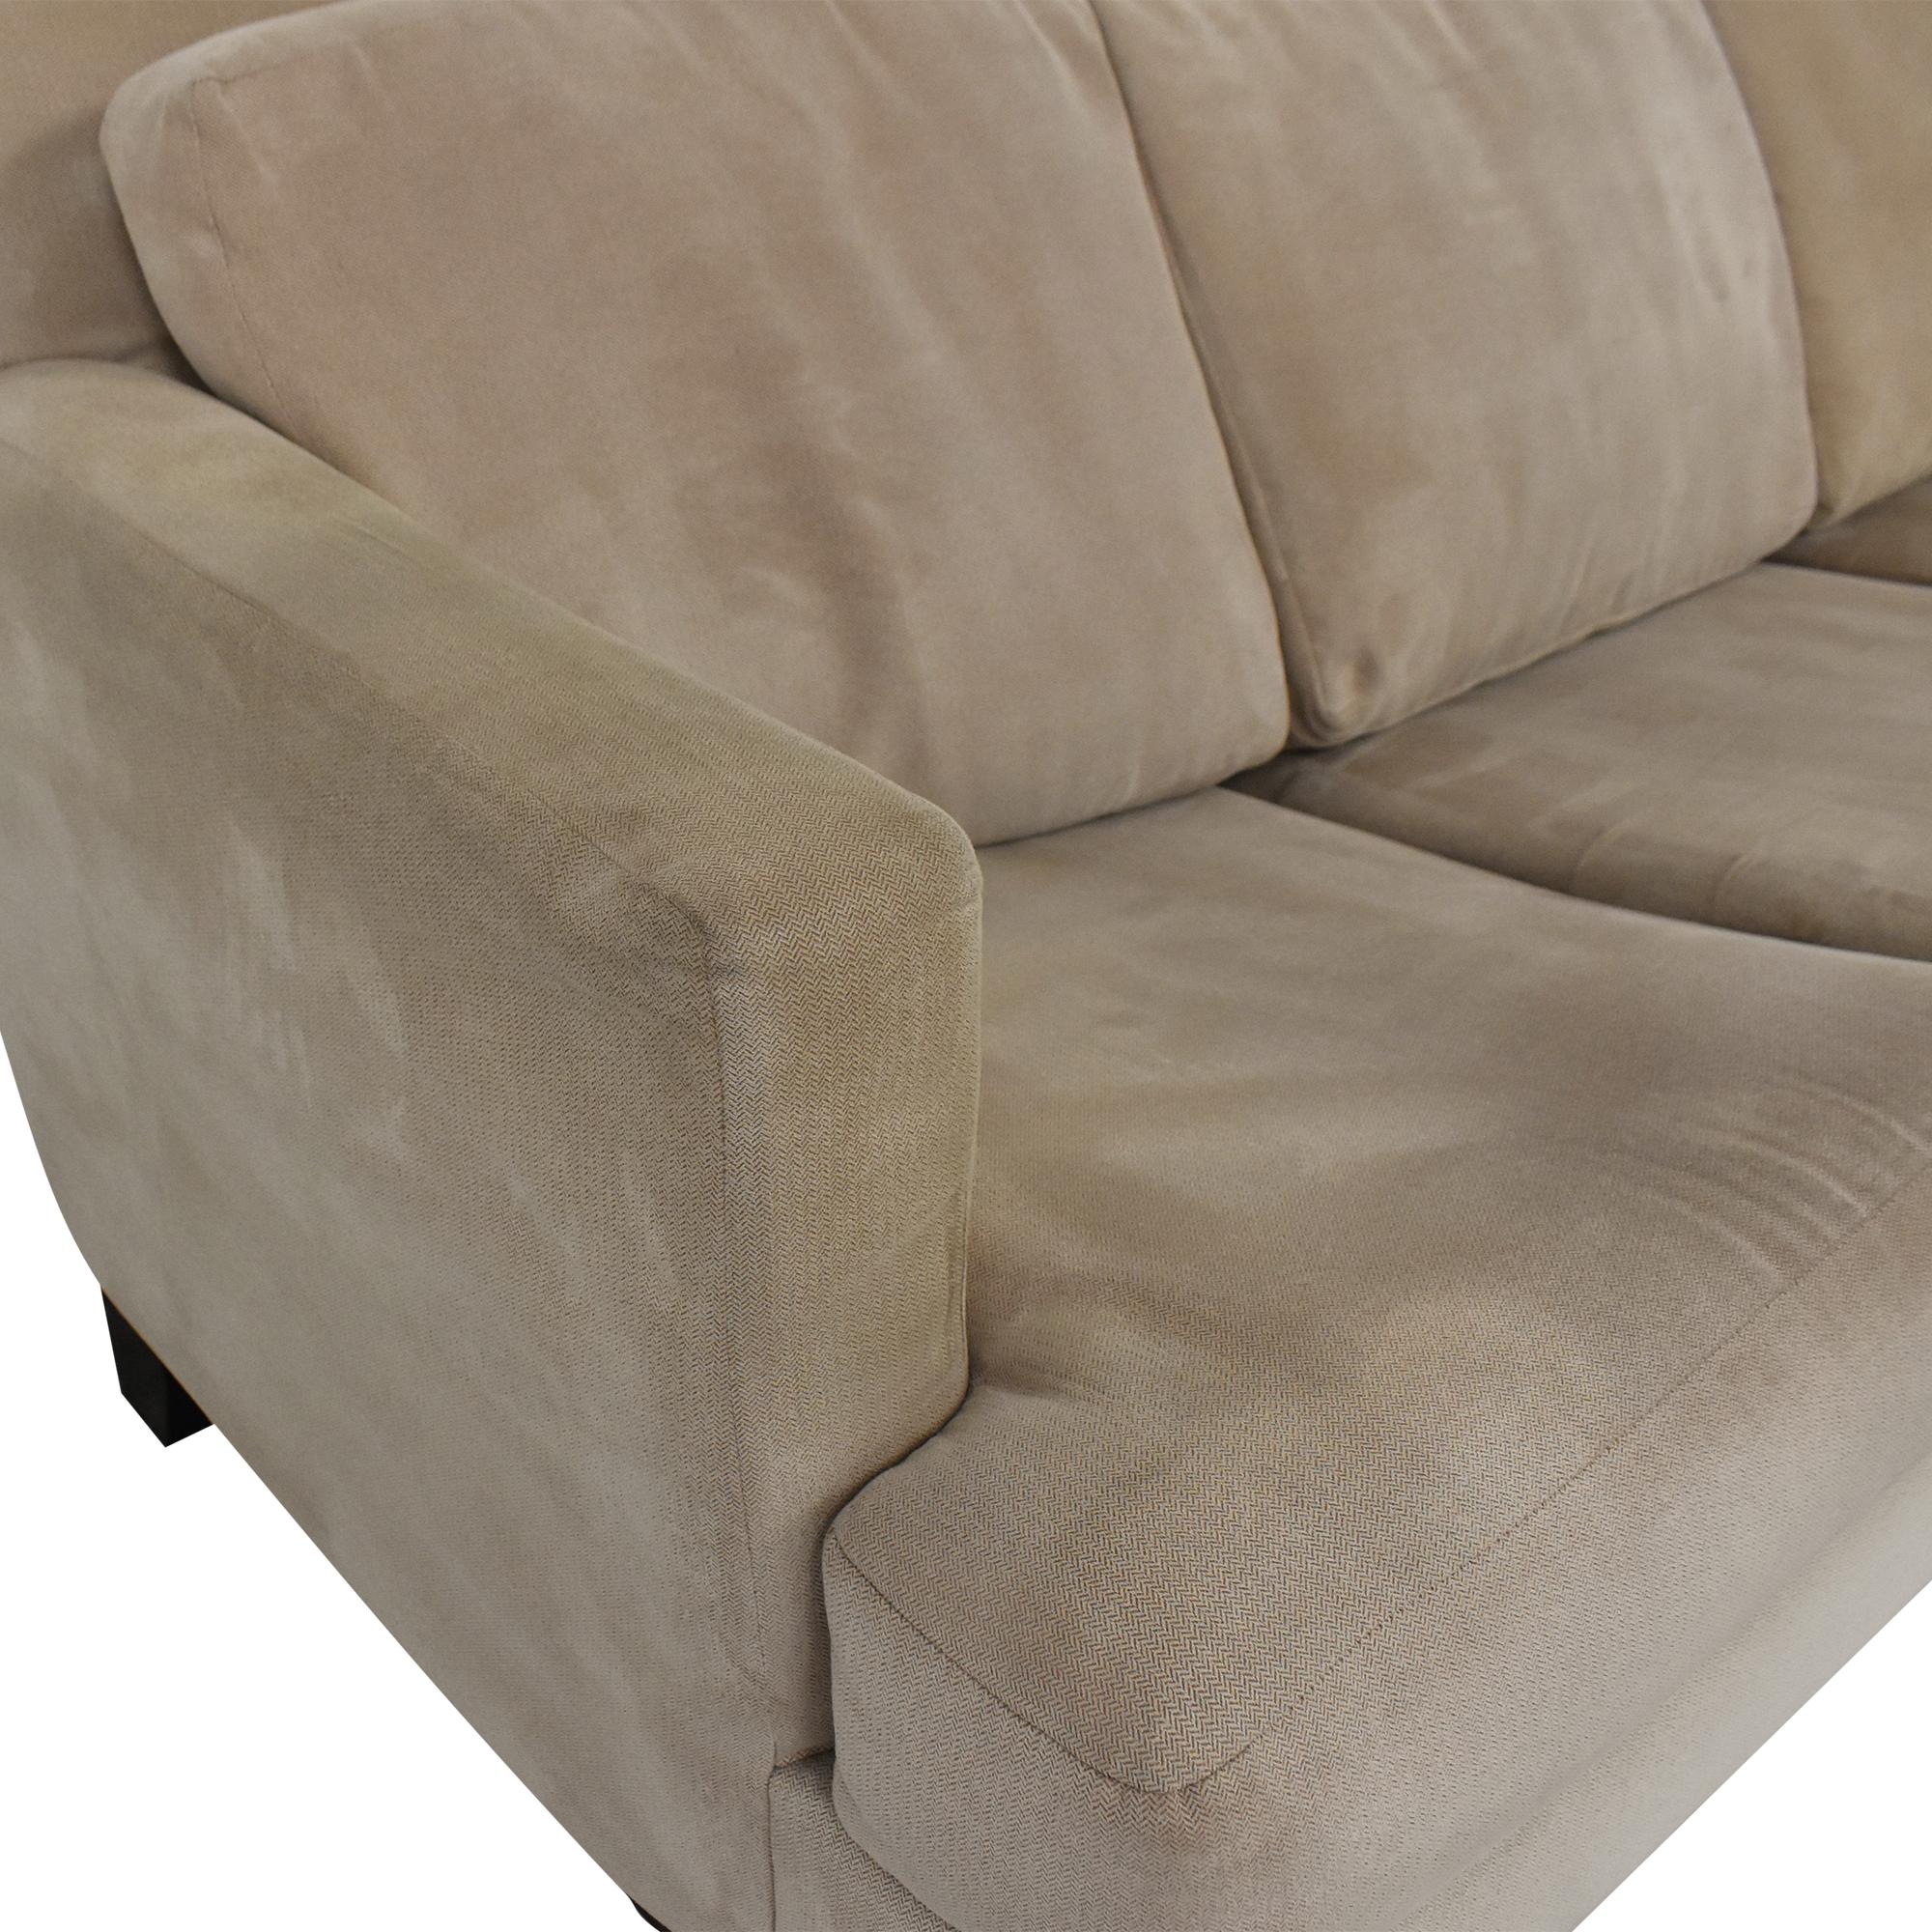 Macy's Macy's Sleeper Sofa price